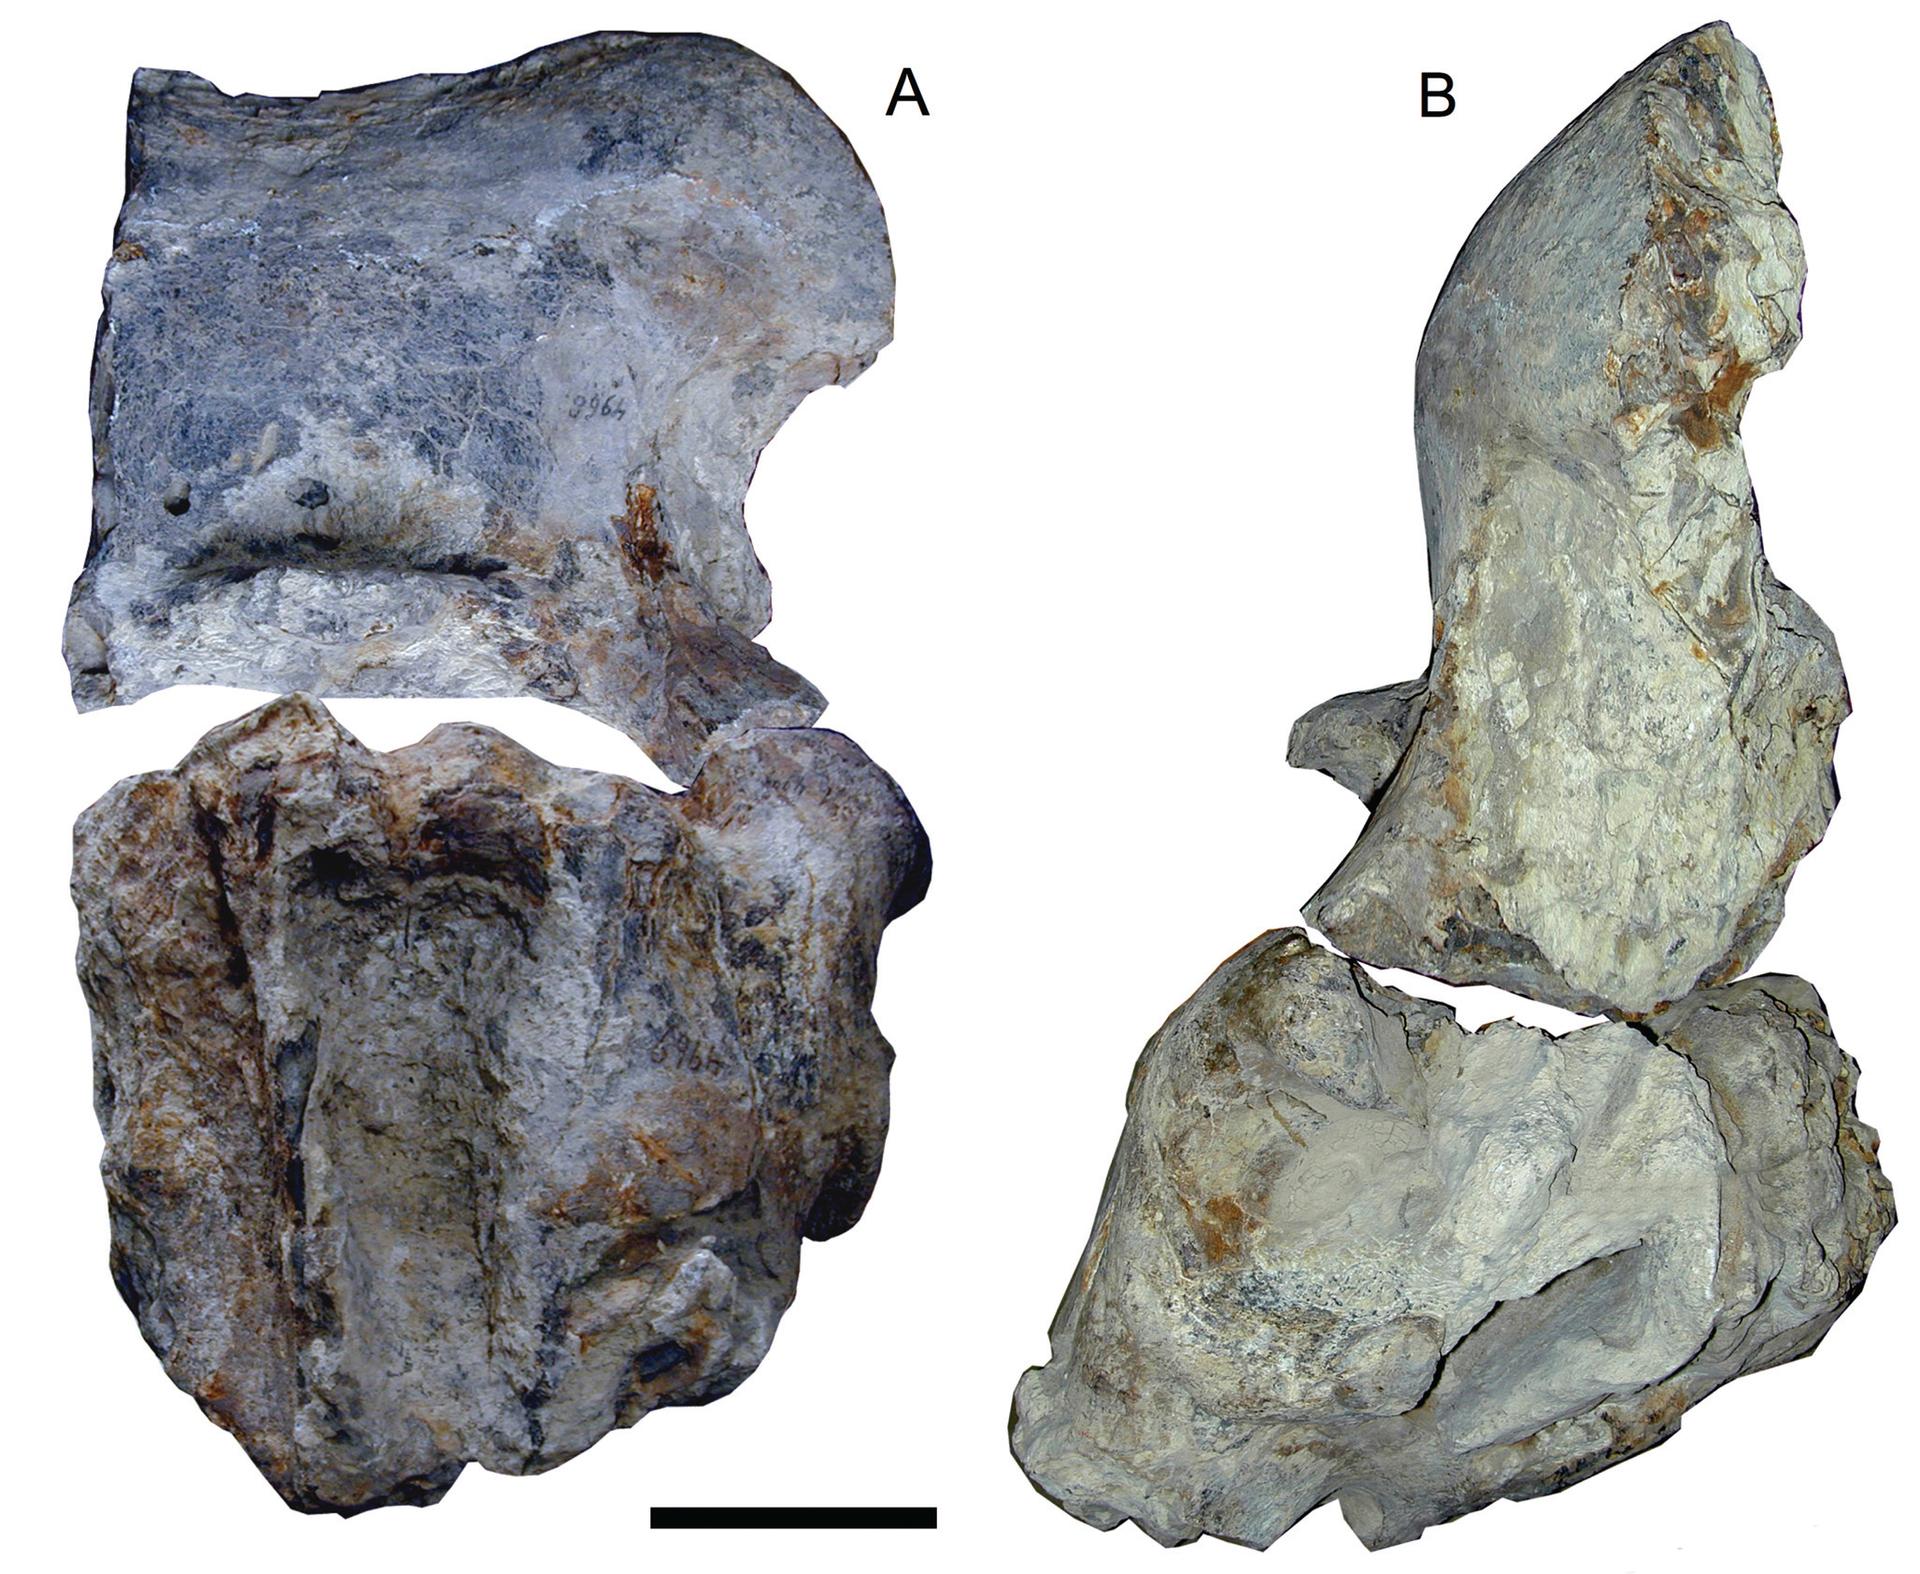 RGM.DUB.4968 | Elephas hysudrindicus Dubois, 1908